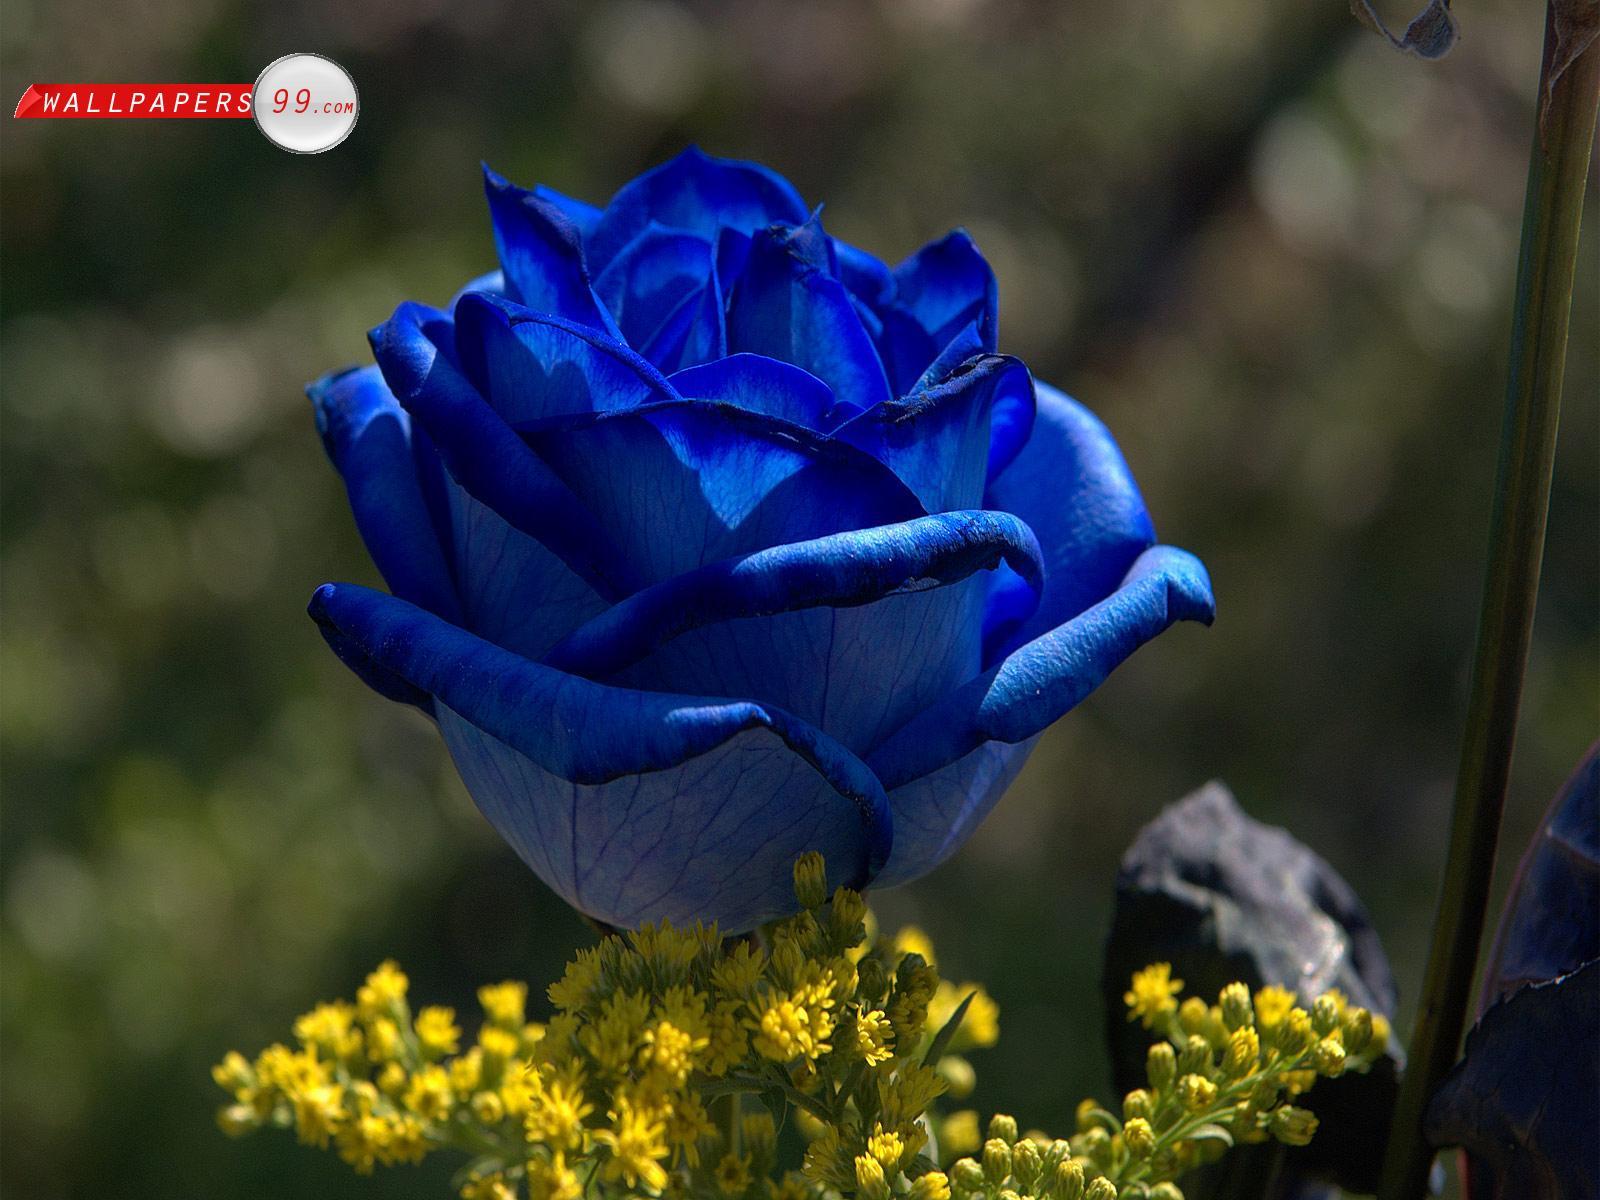 Yellow wallpaper blue rose hd wallpaper free download - Blue rose hd wallpaper download ...